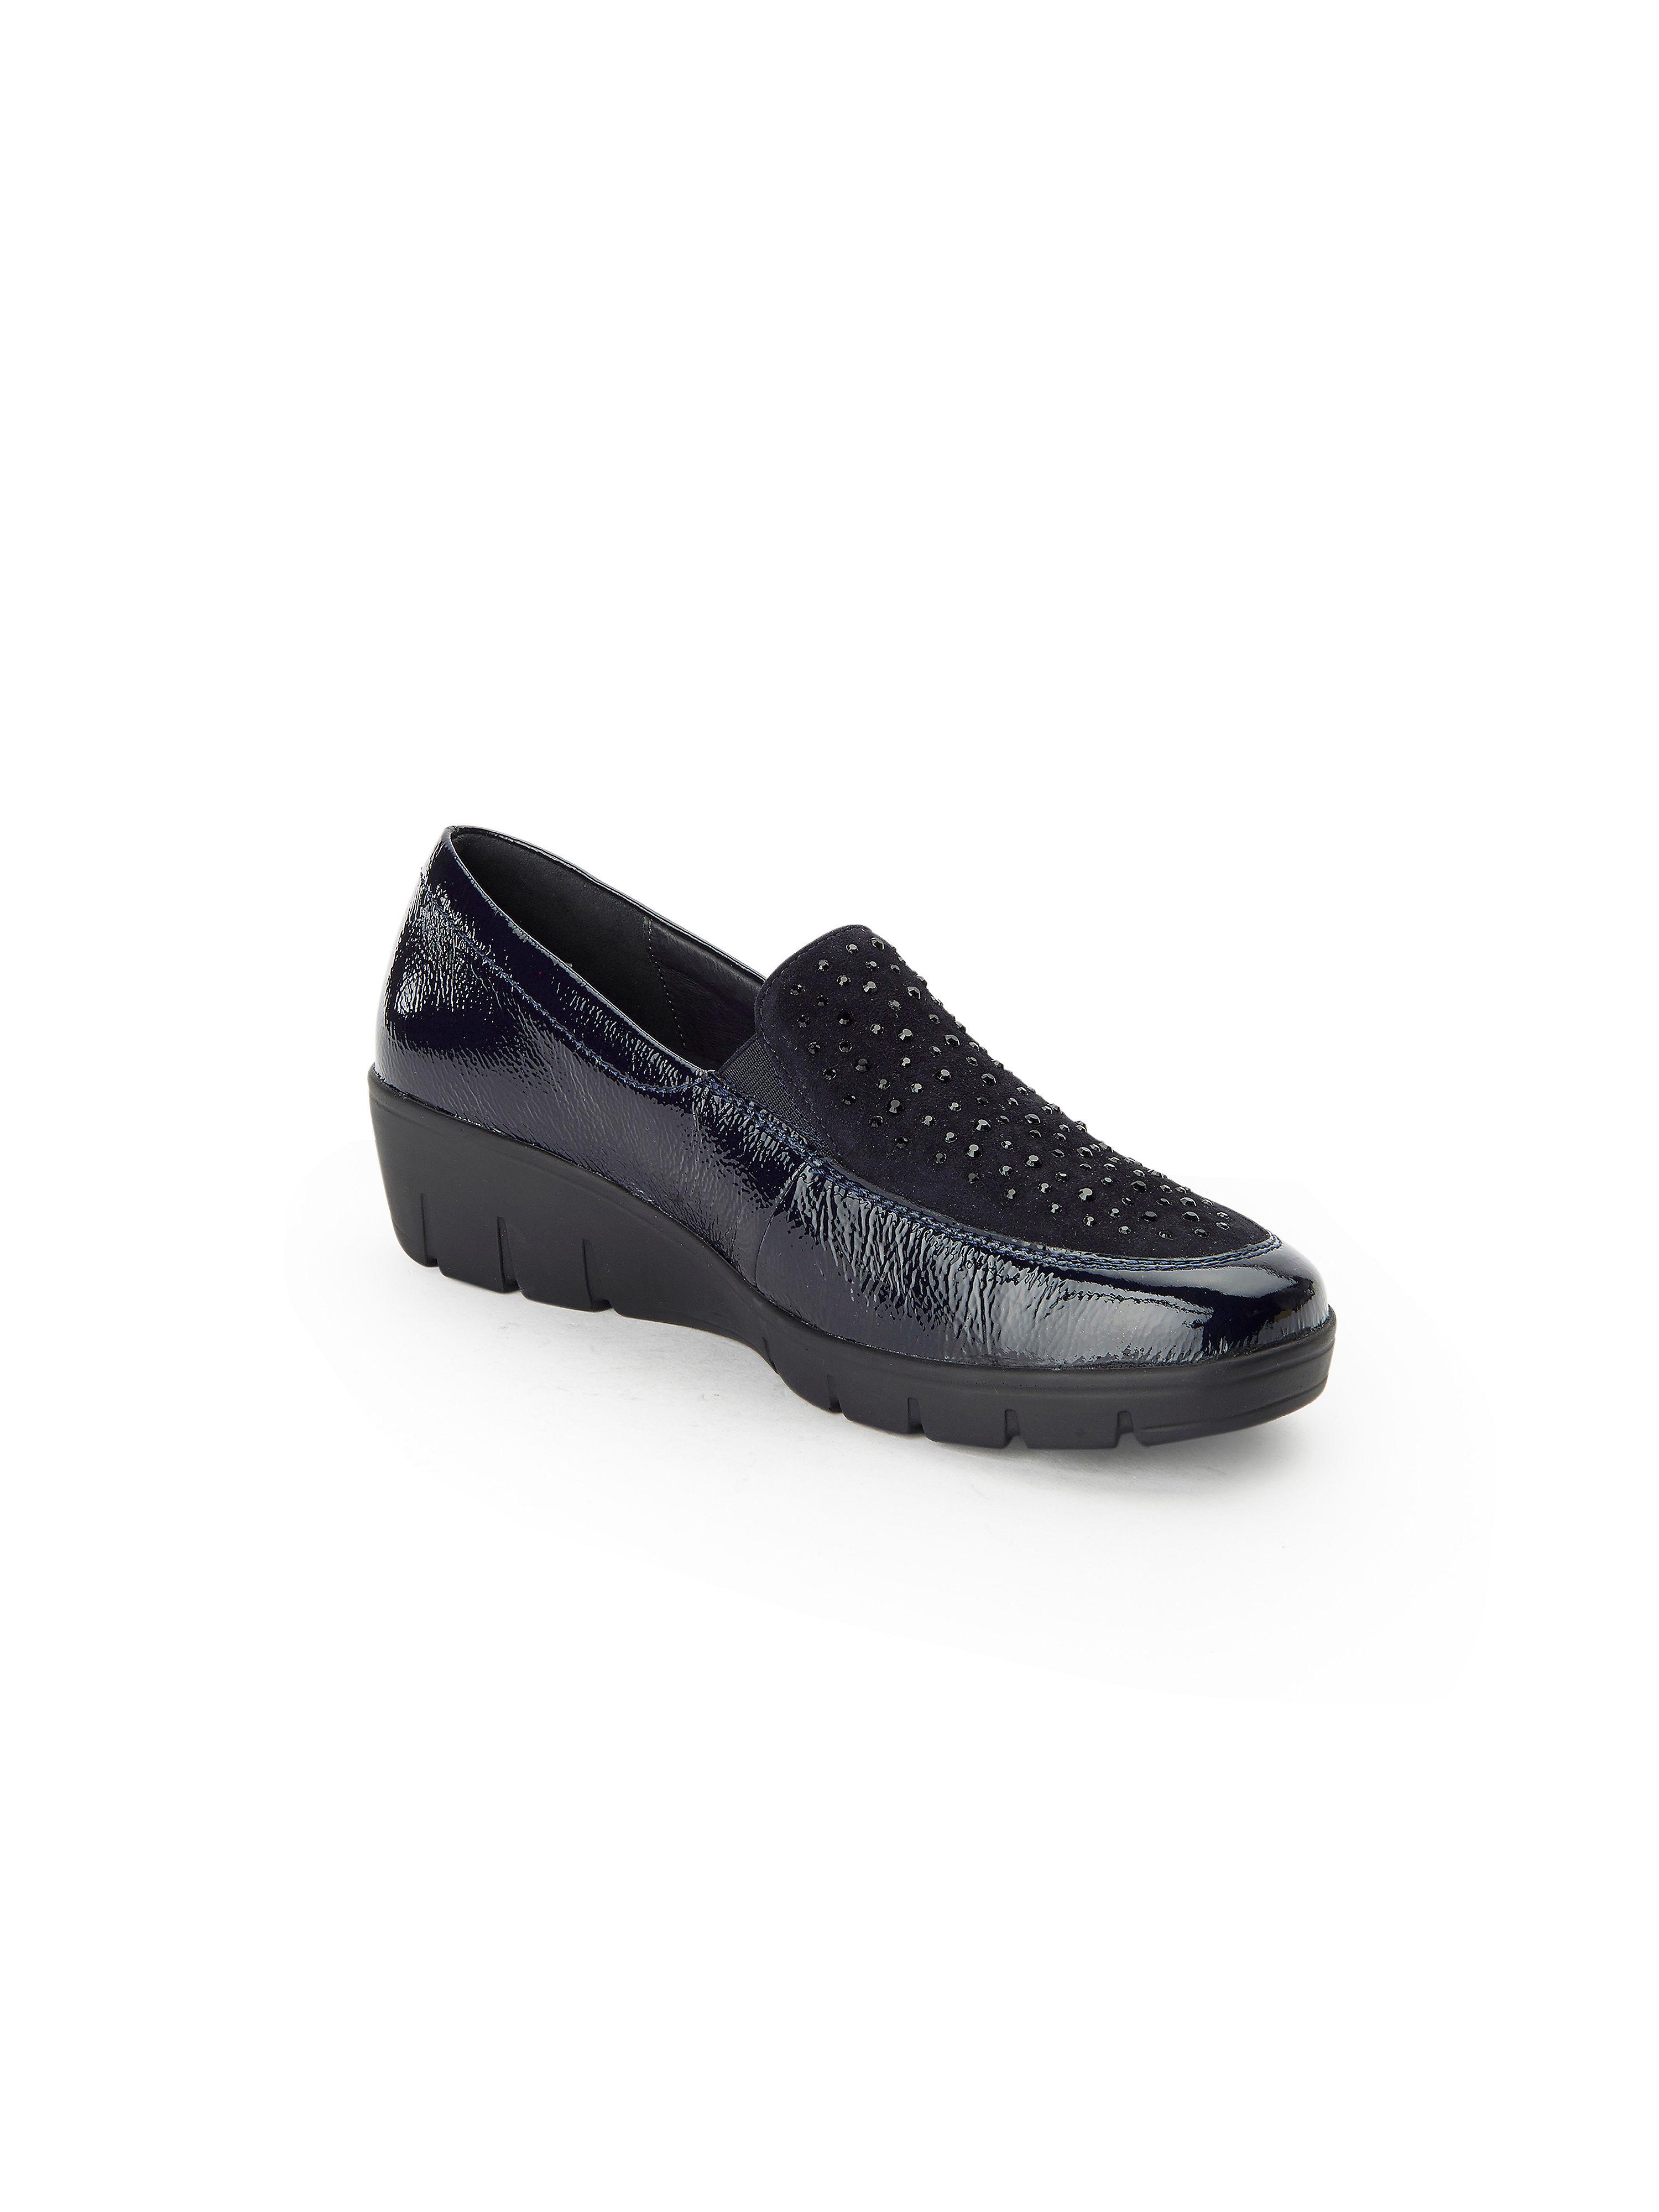 Semler - Slipper JUDITH - Marine Gute Qualität beliebte Schuhe